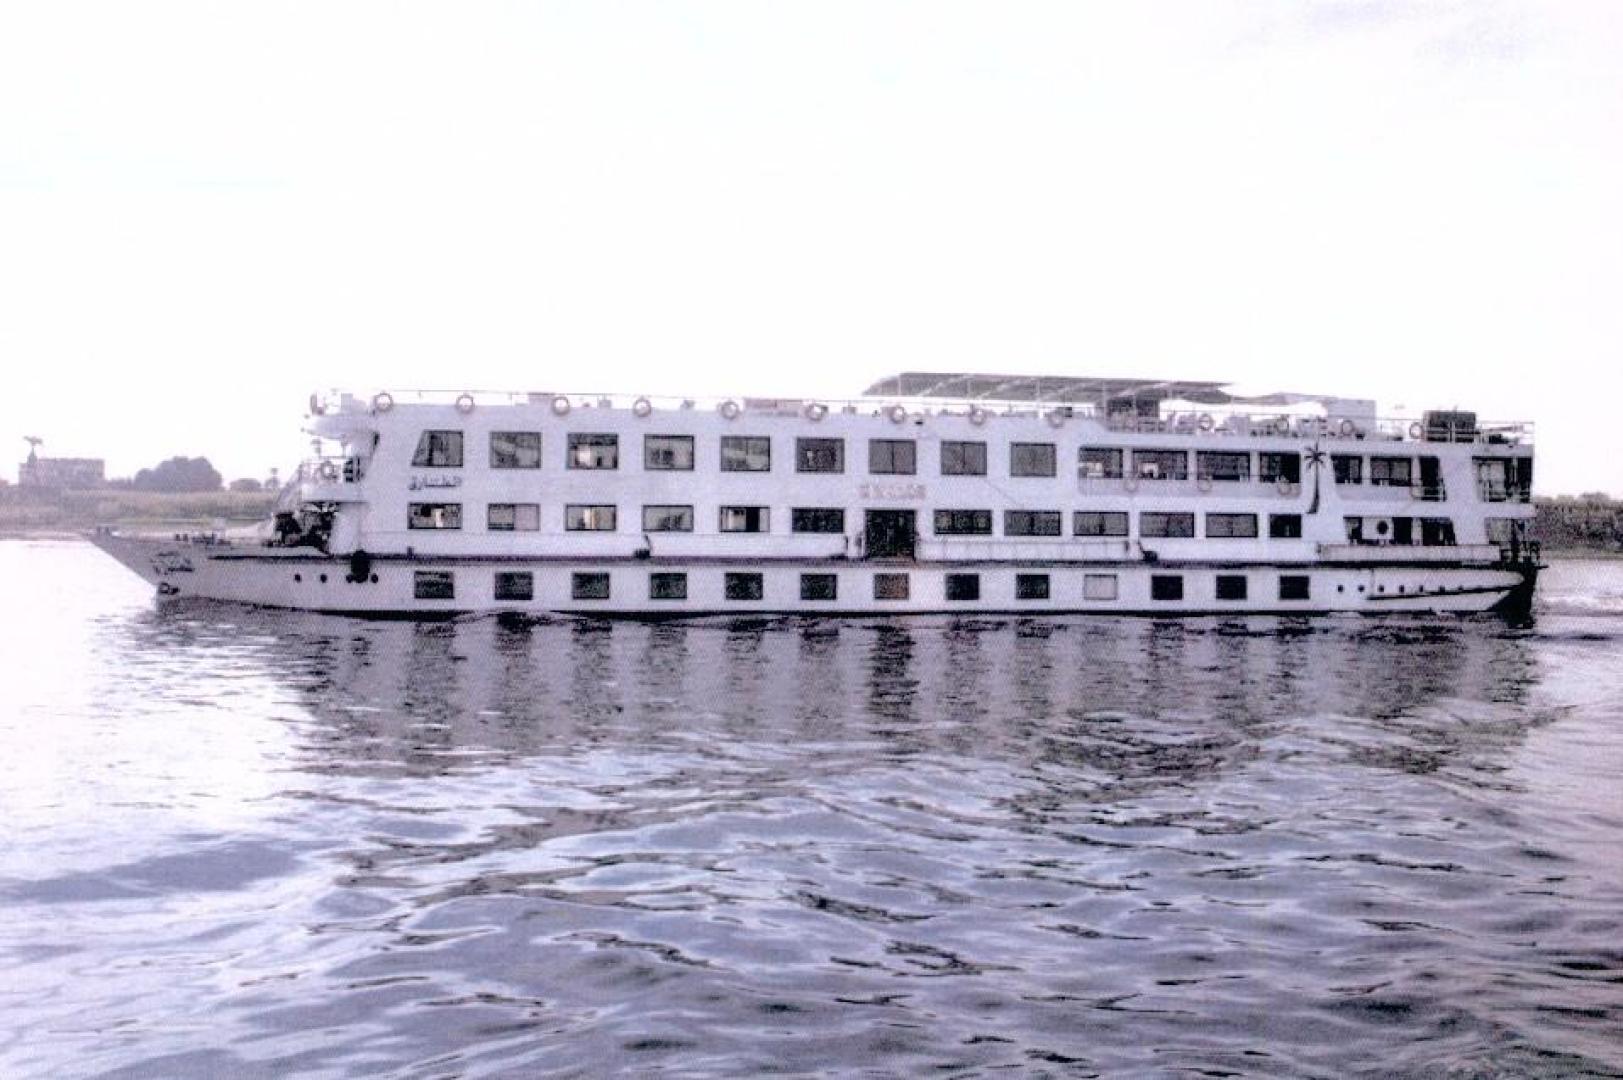 207' Custom Floating Hotel / River Boat